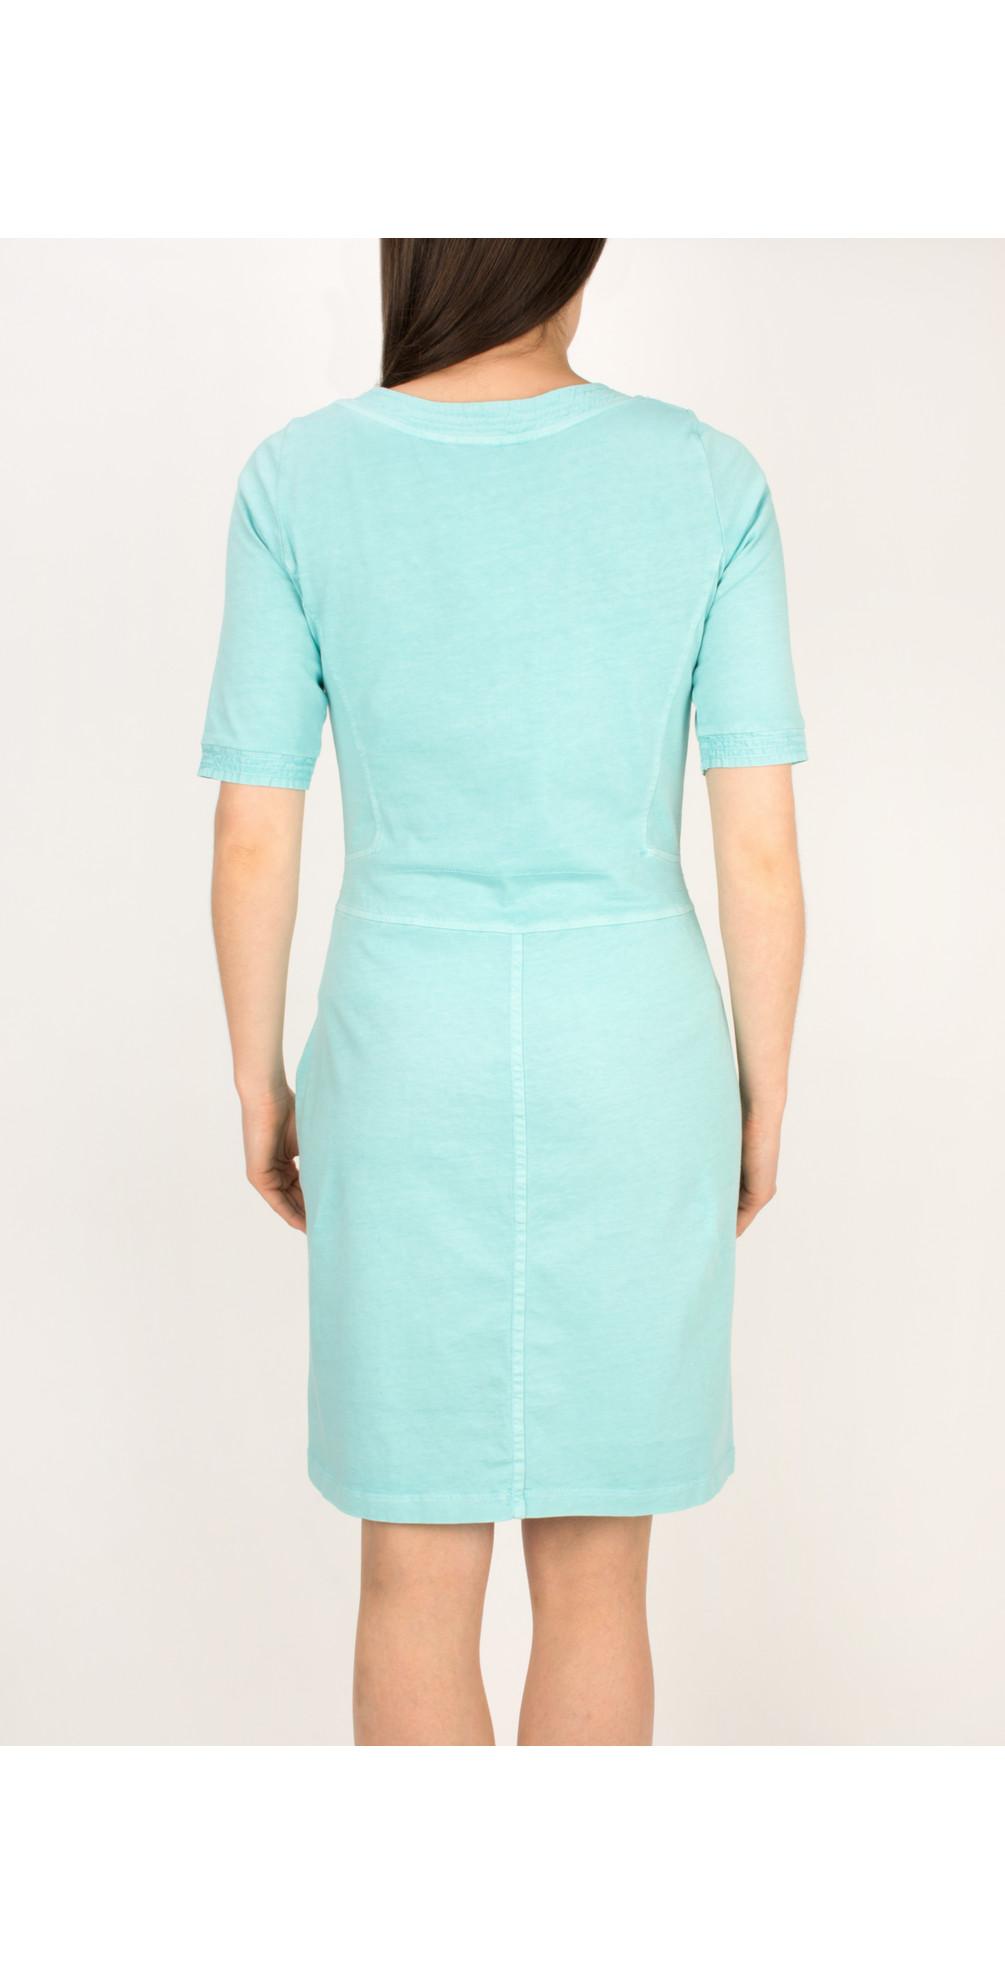 sandwich clothing single jersey dress in angel blue. Black Bedroom Furniture Sets. Home Design Ideas